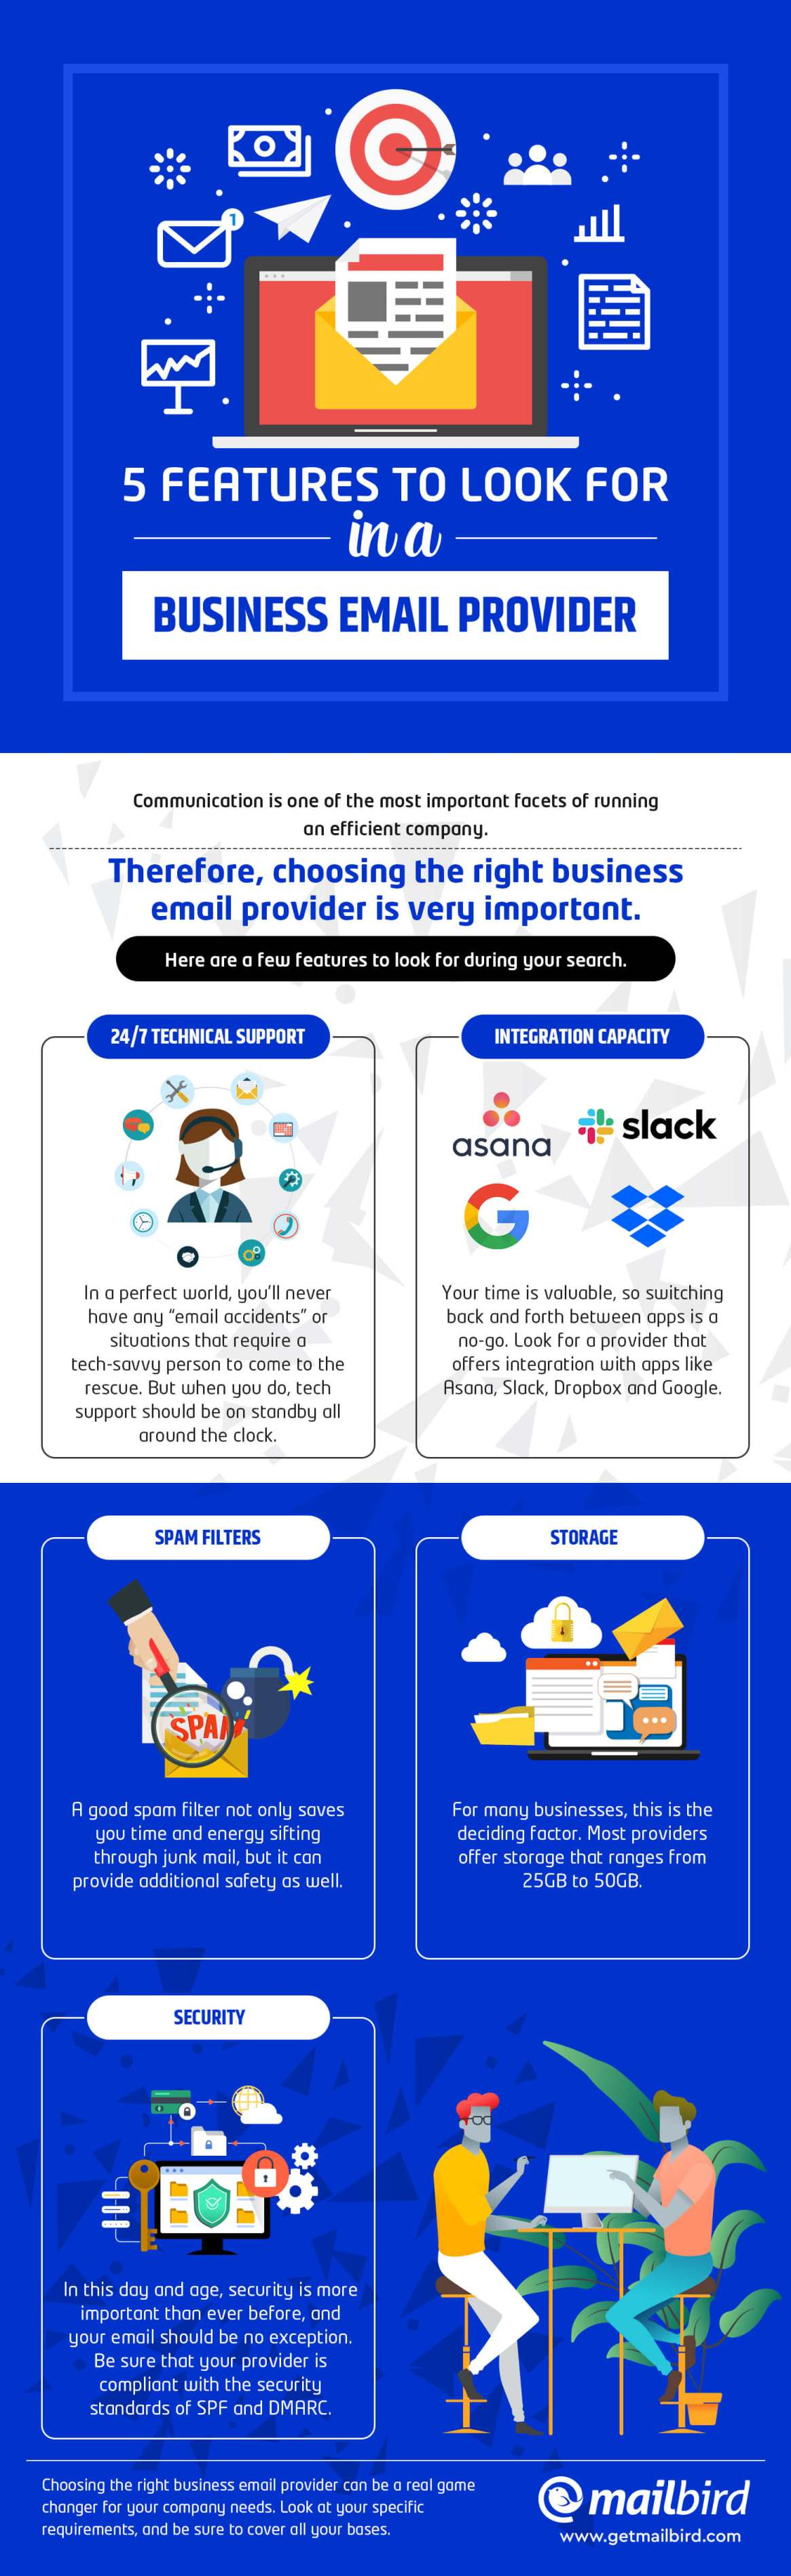 https://www.getmailbird.com/best-email-service-for-business/